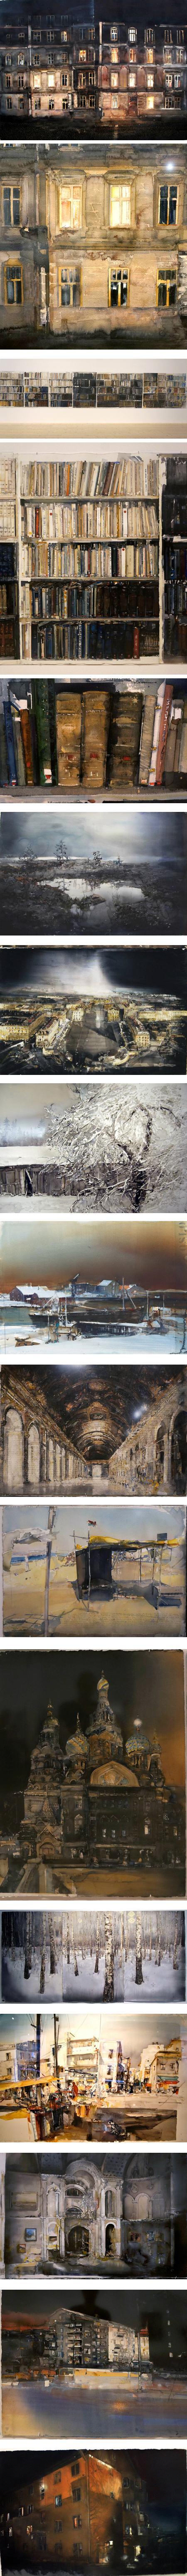 Lars Lerin, watercolors